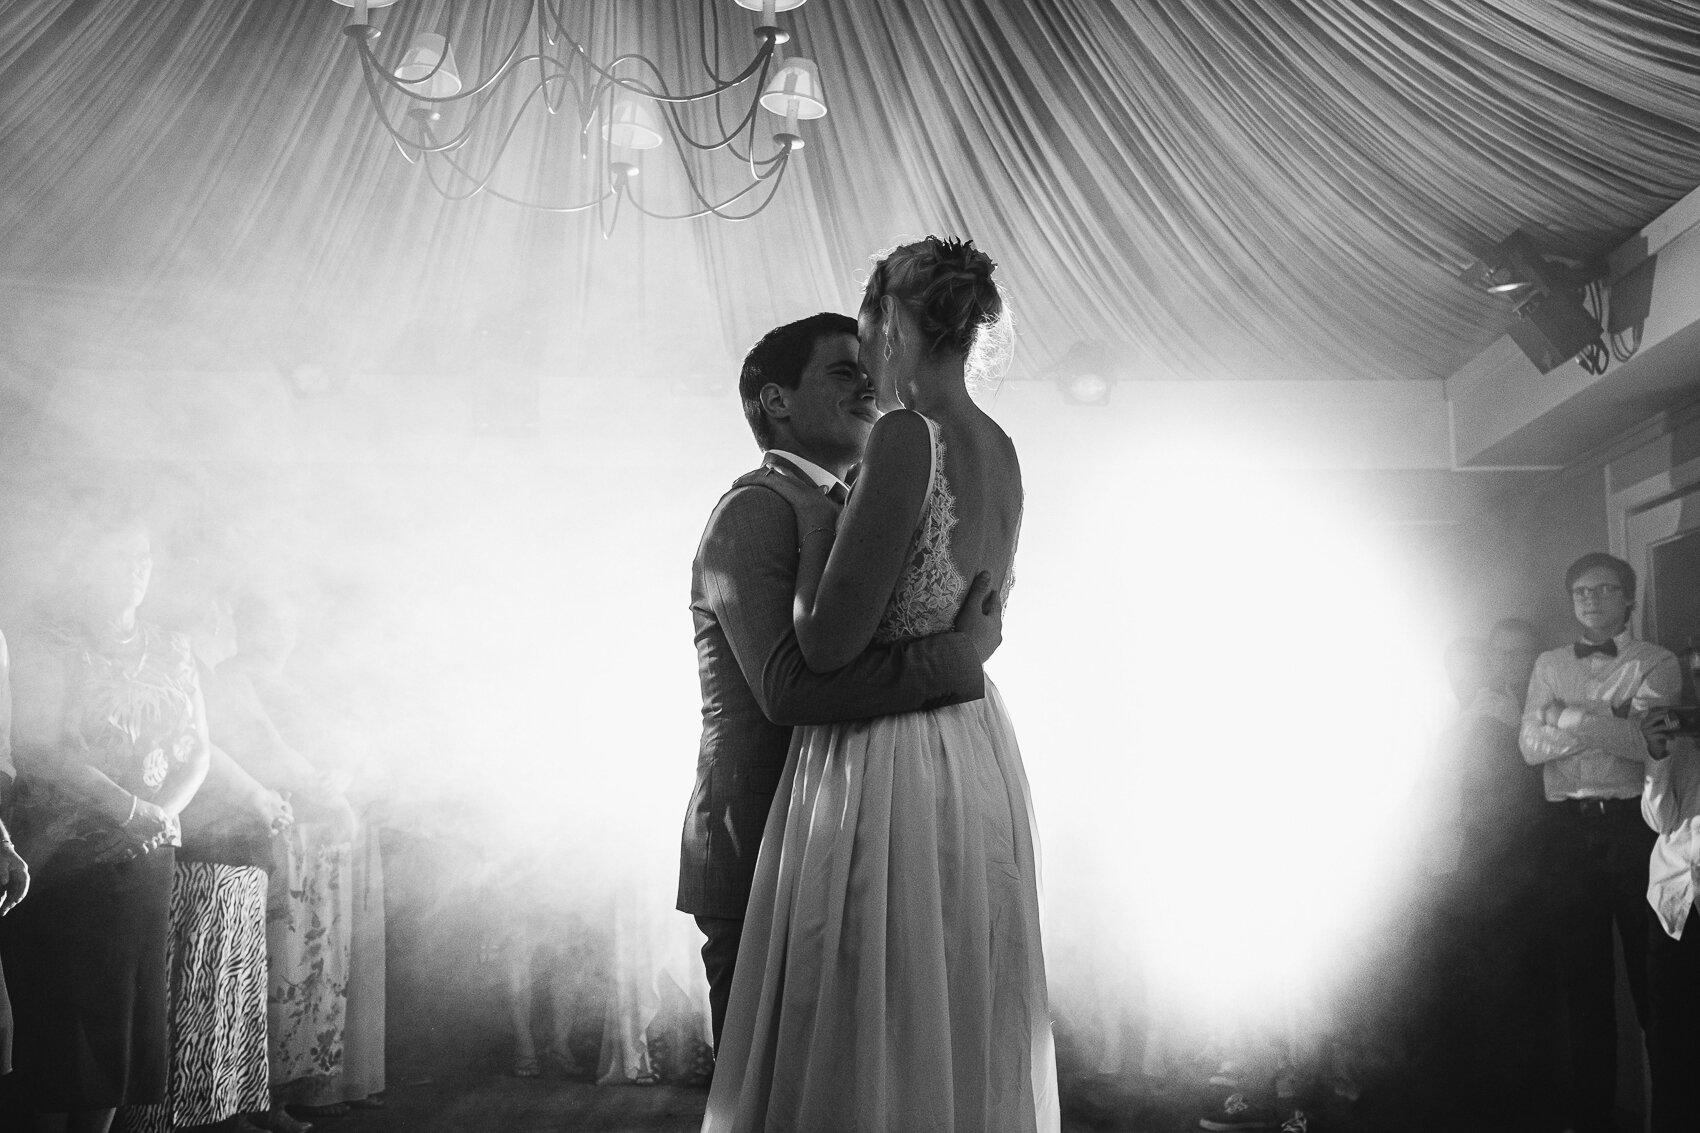 iso800 - huwelijksfotograaf isabo matthias verbeke foundation-35.jpg